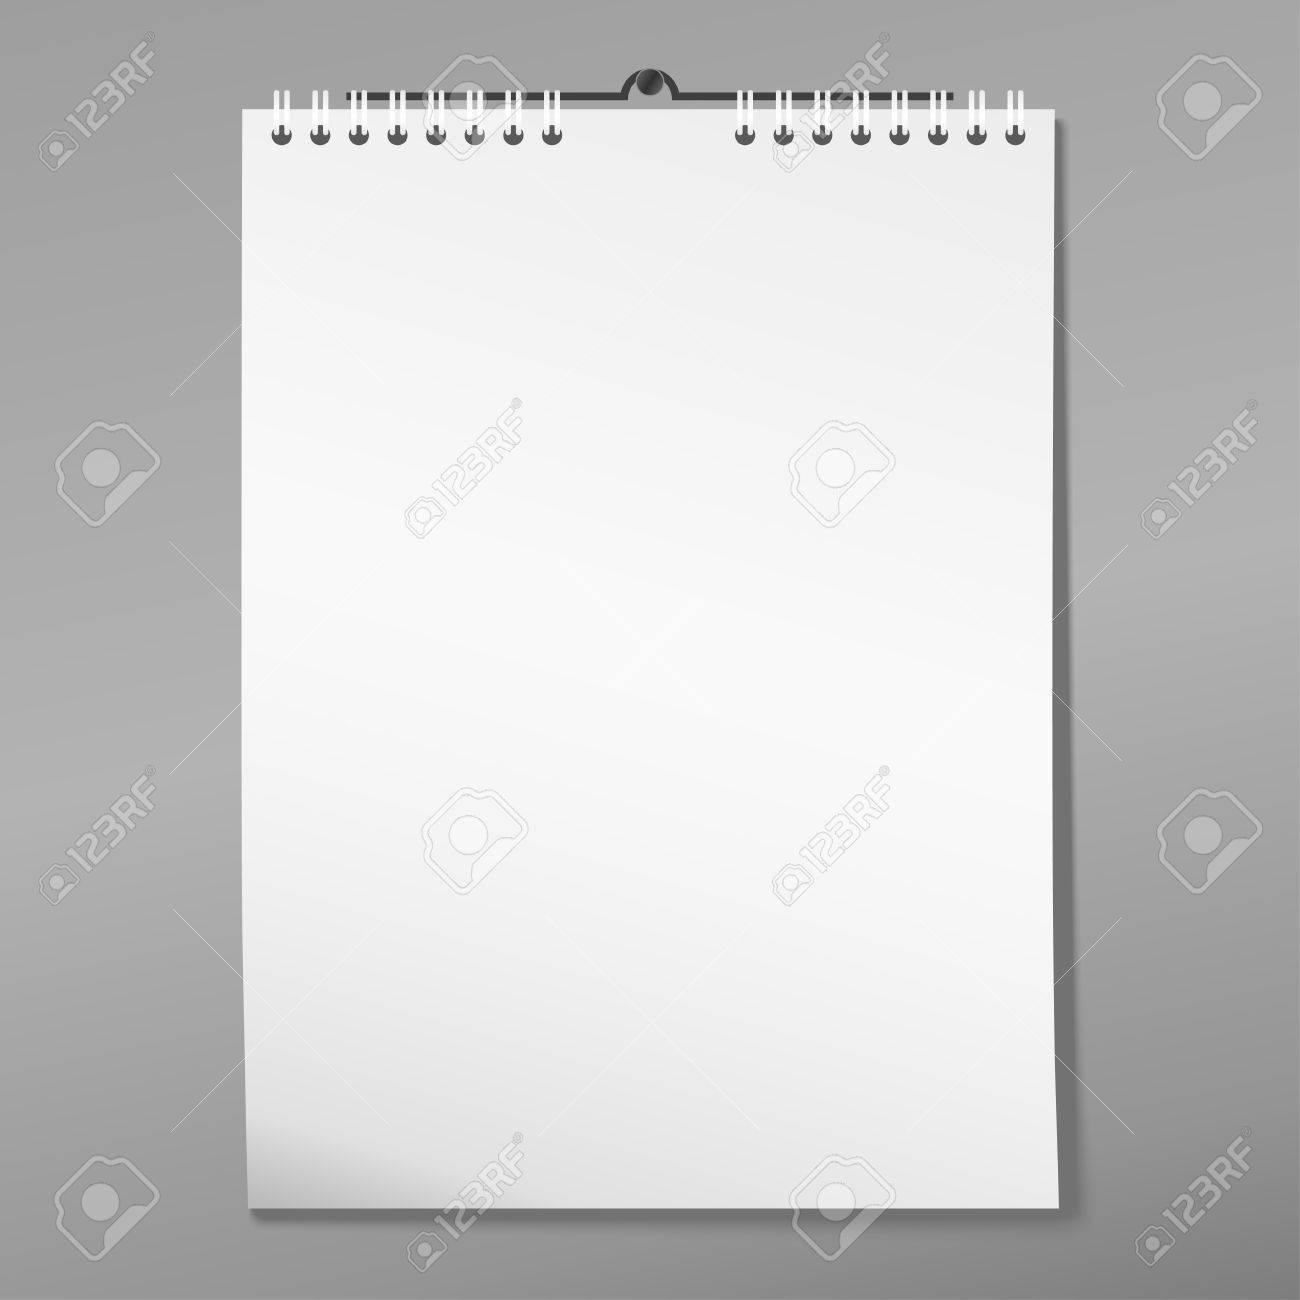 blank document free – Blank Document Free